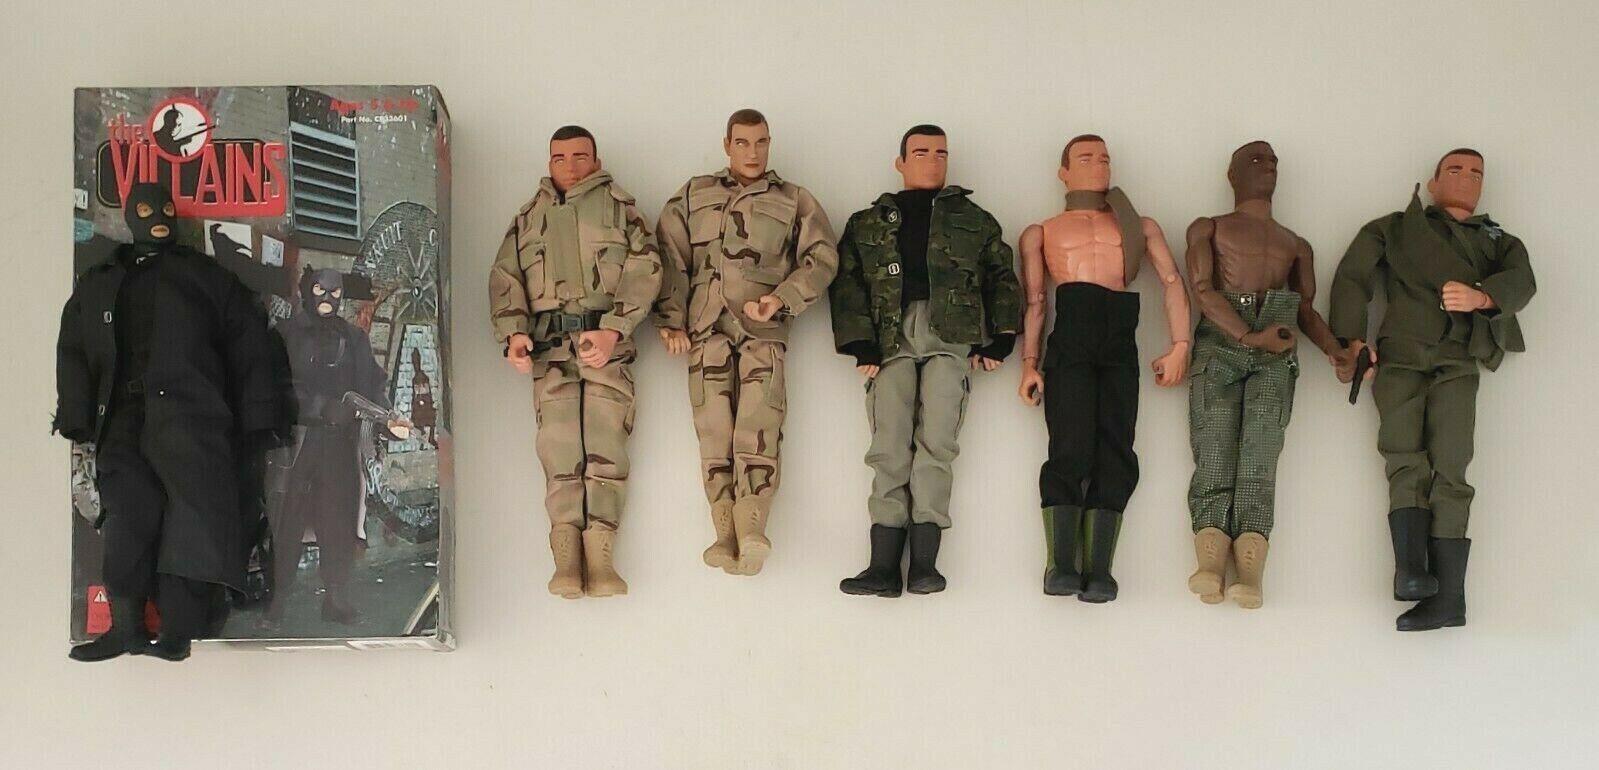 21st Century Toys Gi Joe 1998 Lote de 7 Juguete Ejército Soldado Figuras